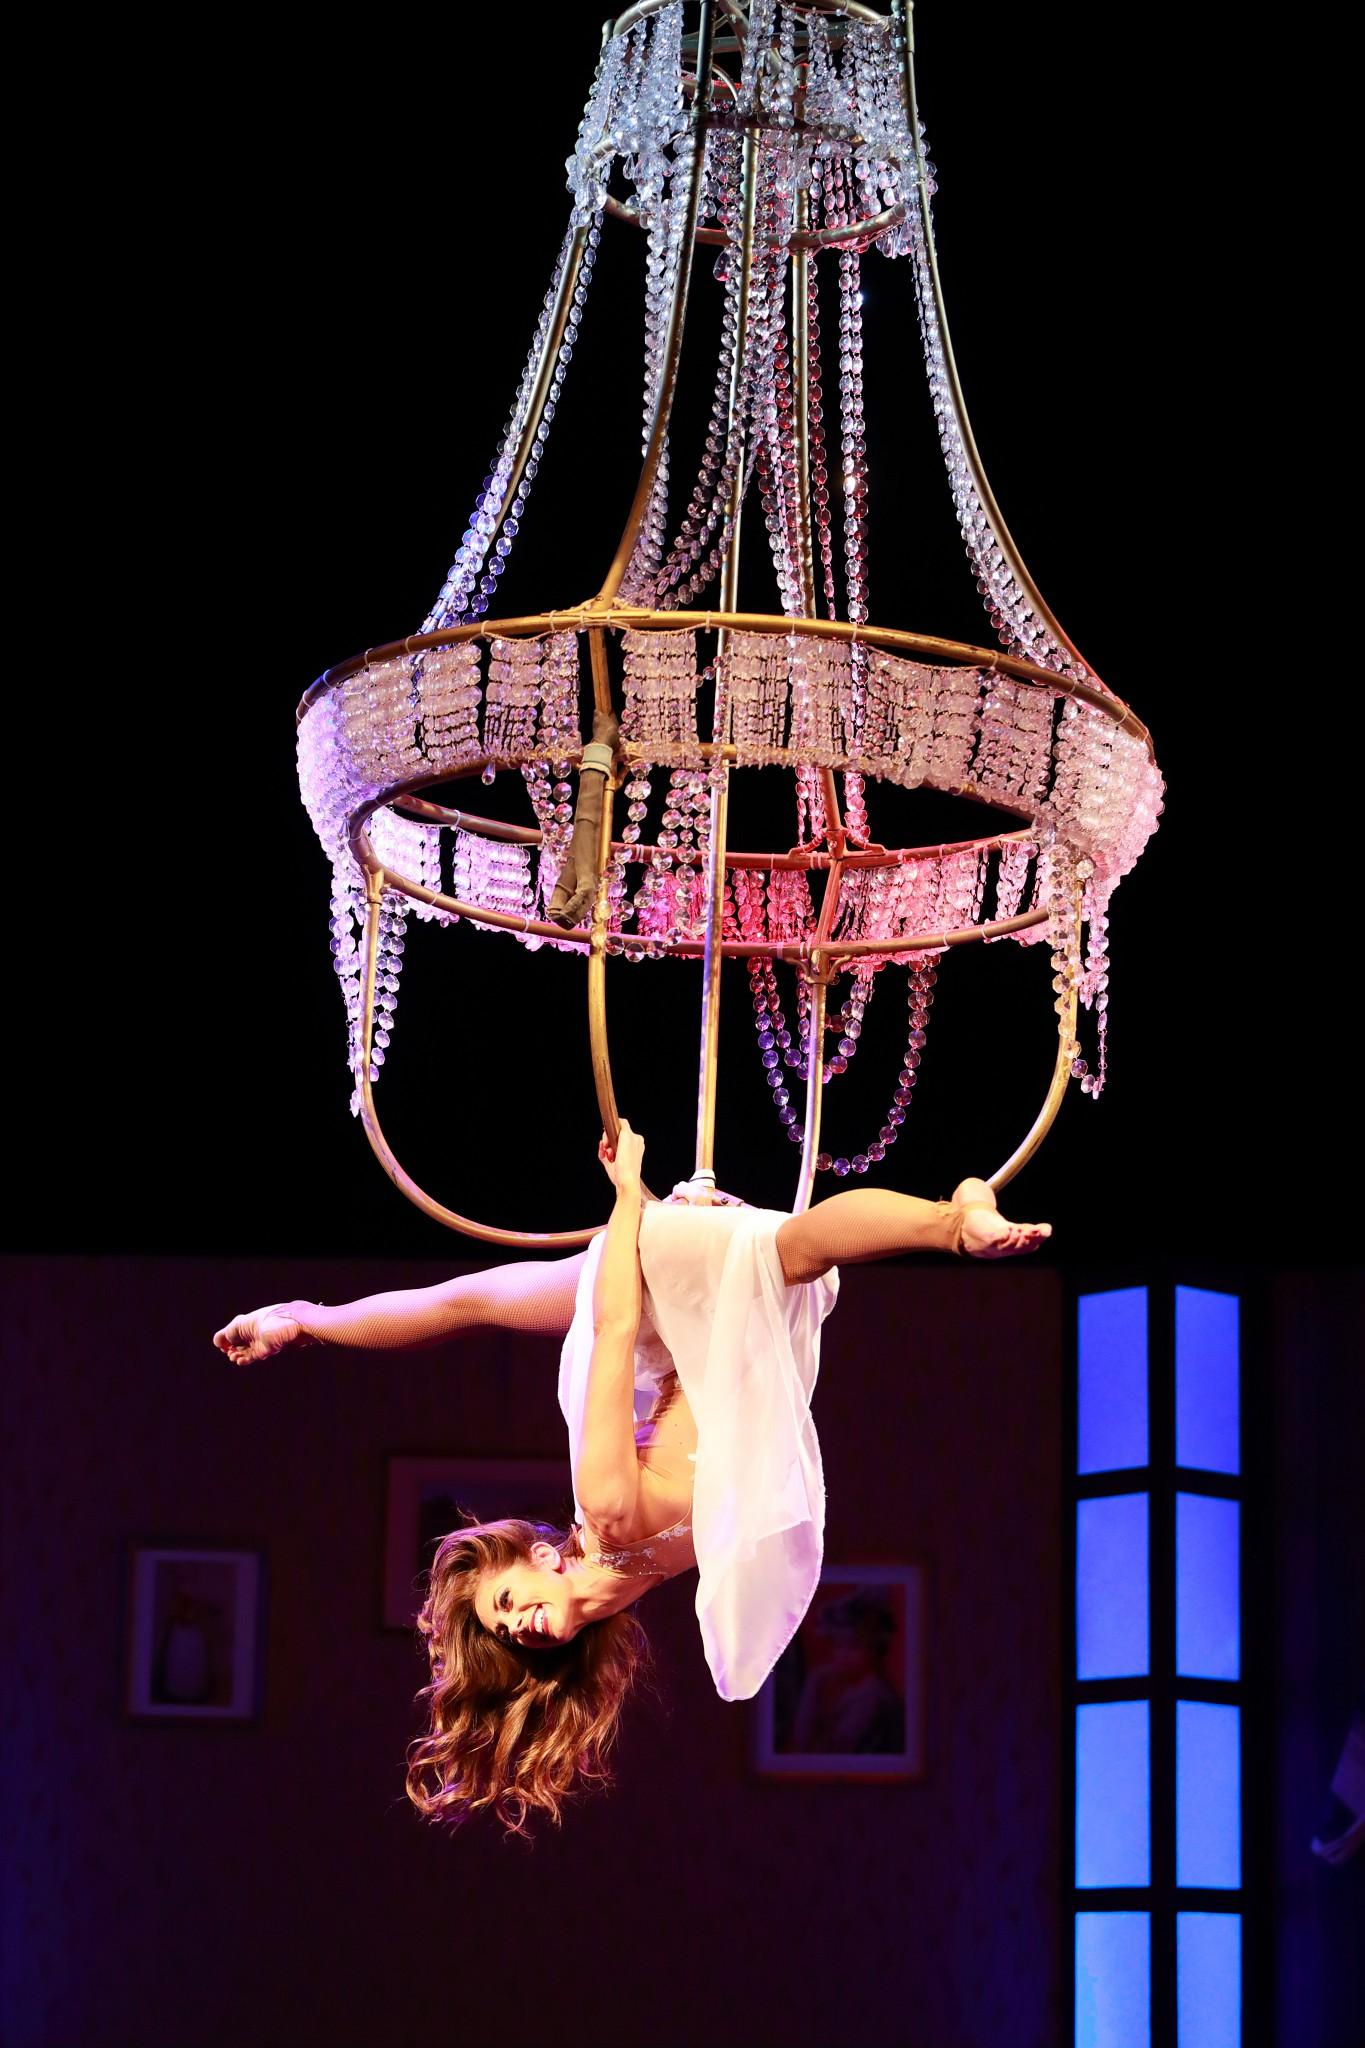 Flying Chandelier Performance - Kronleuchter Showact - Air Candy dassupertalent luftartistin am Kronleuchter